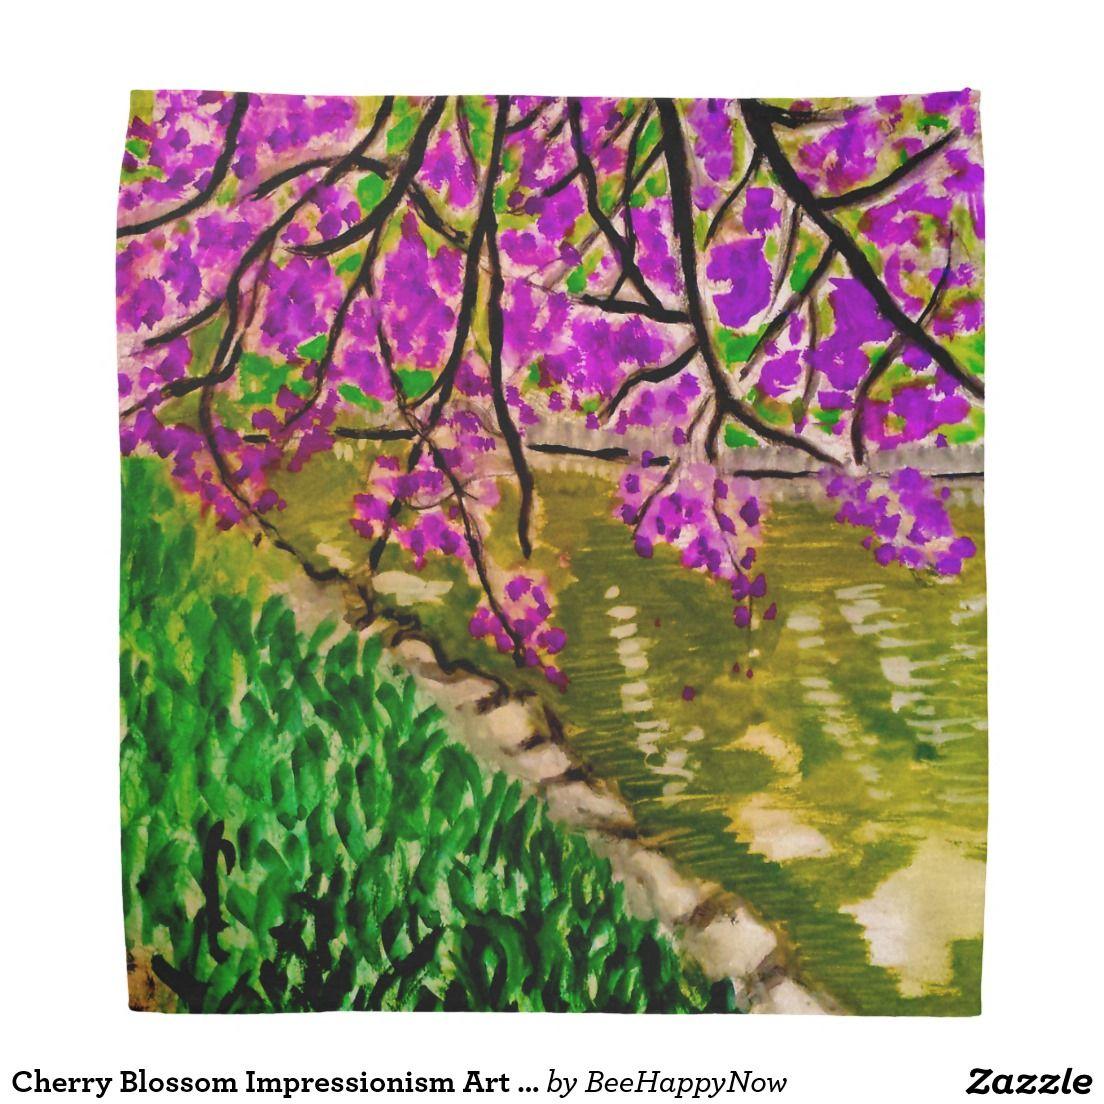 Cherry Blossom Impressionism Art on Bandana